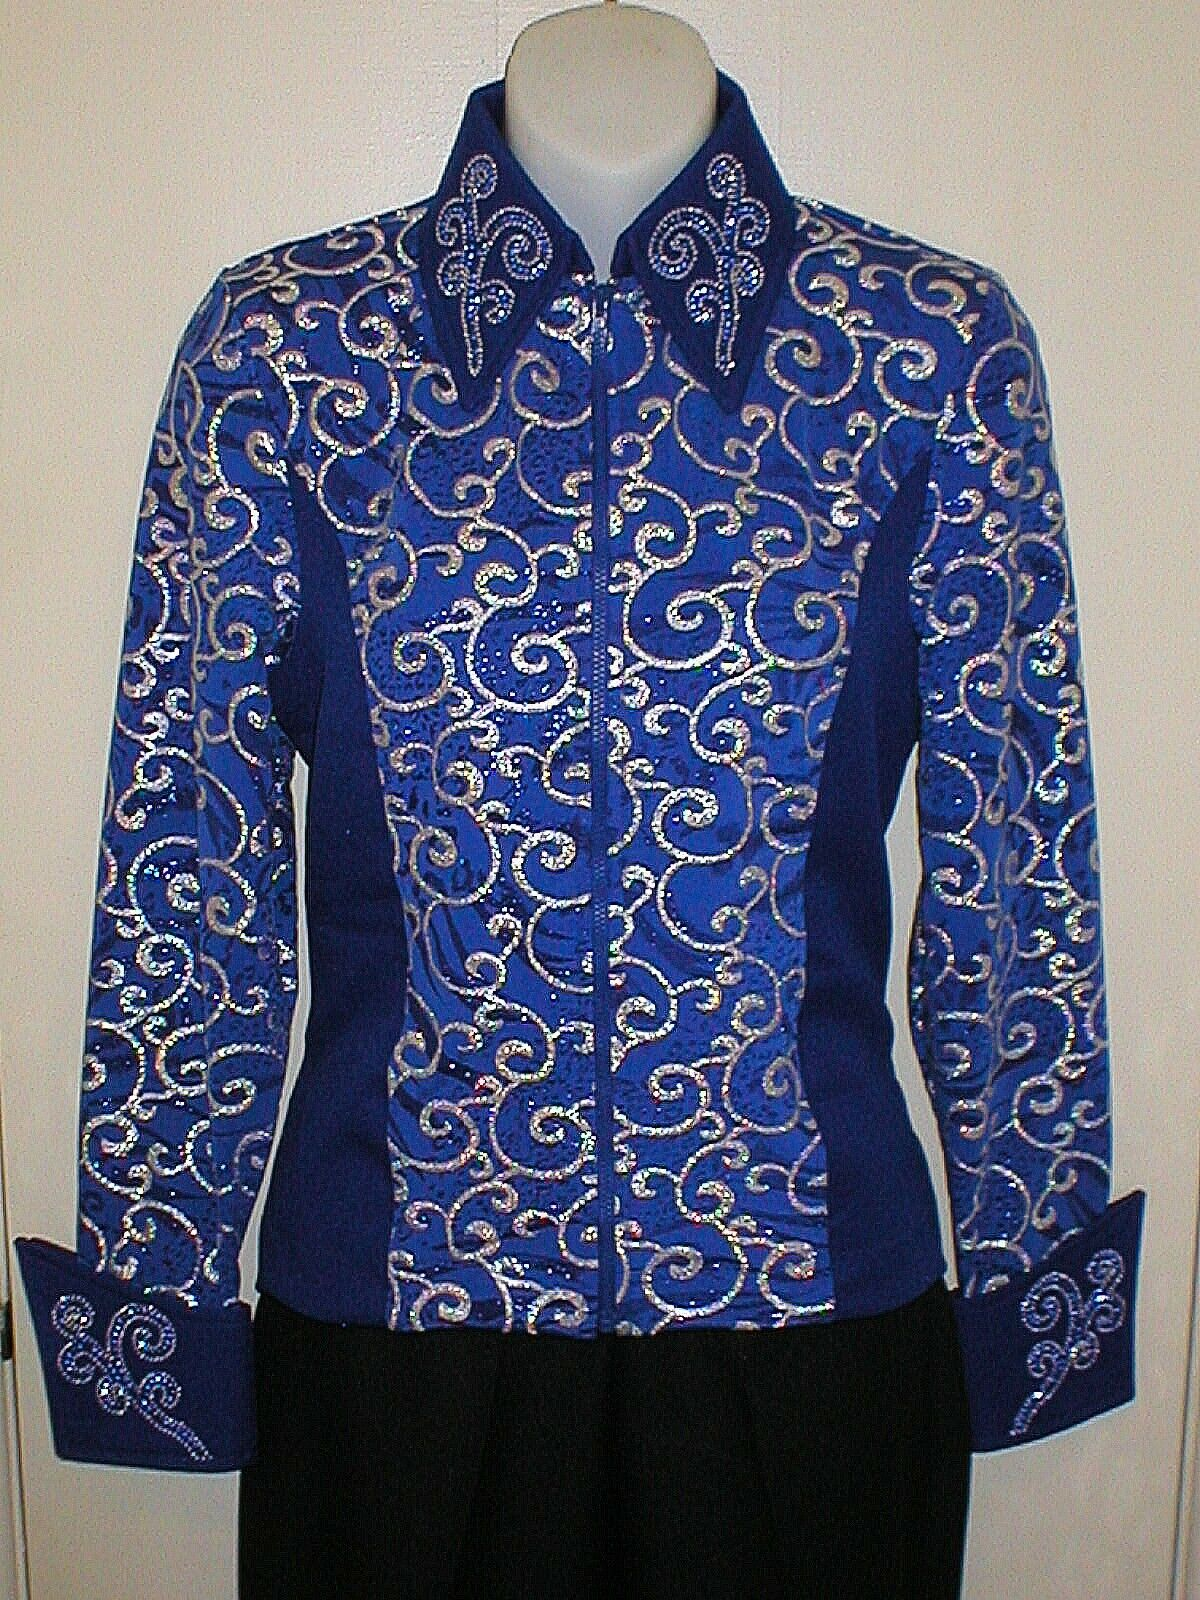 donnas Rail, Glamor, Reining, Trail, Pleasure, astaeo Shirt 5630  3